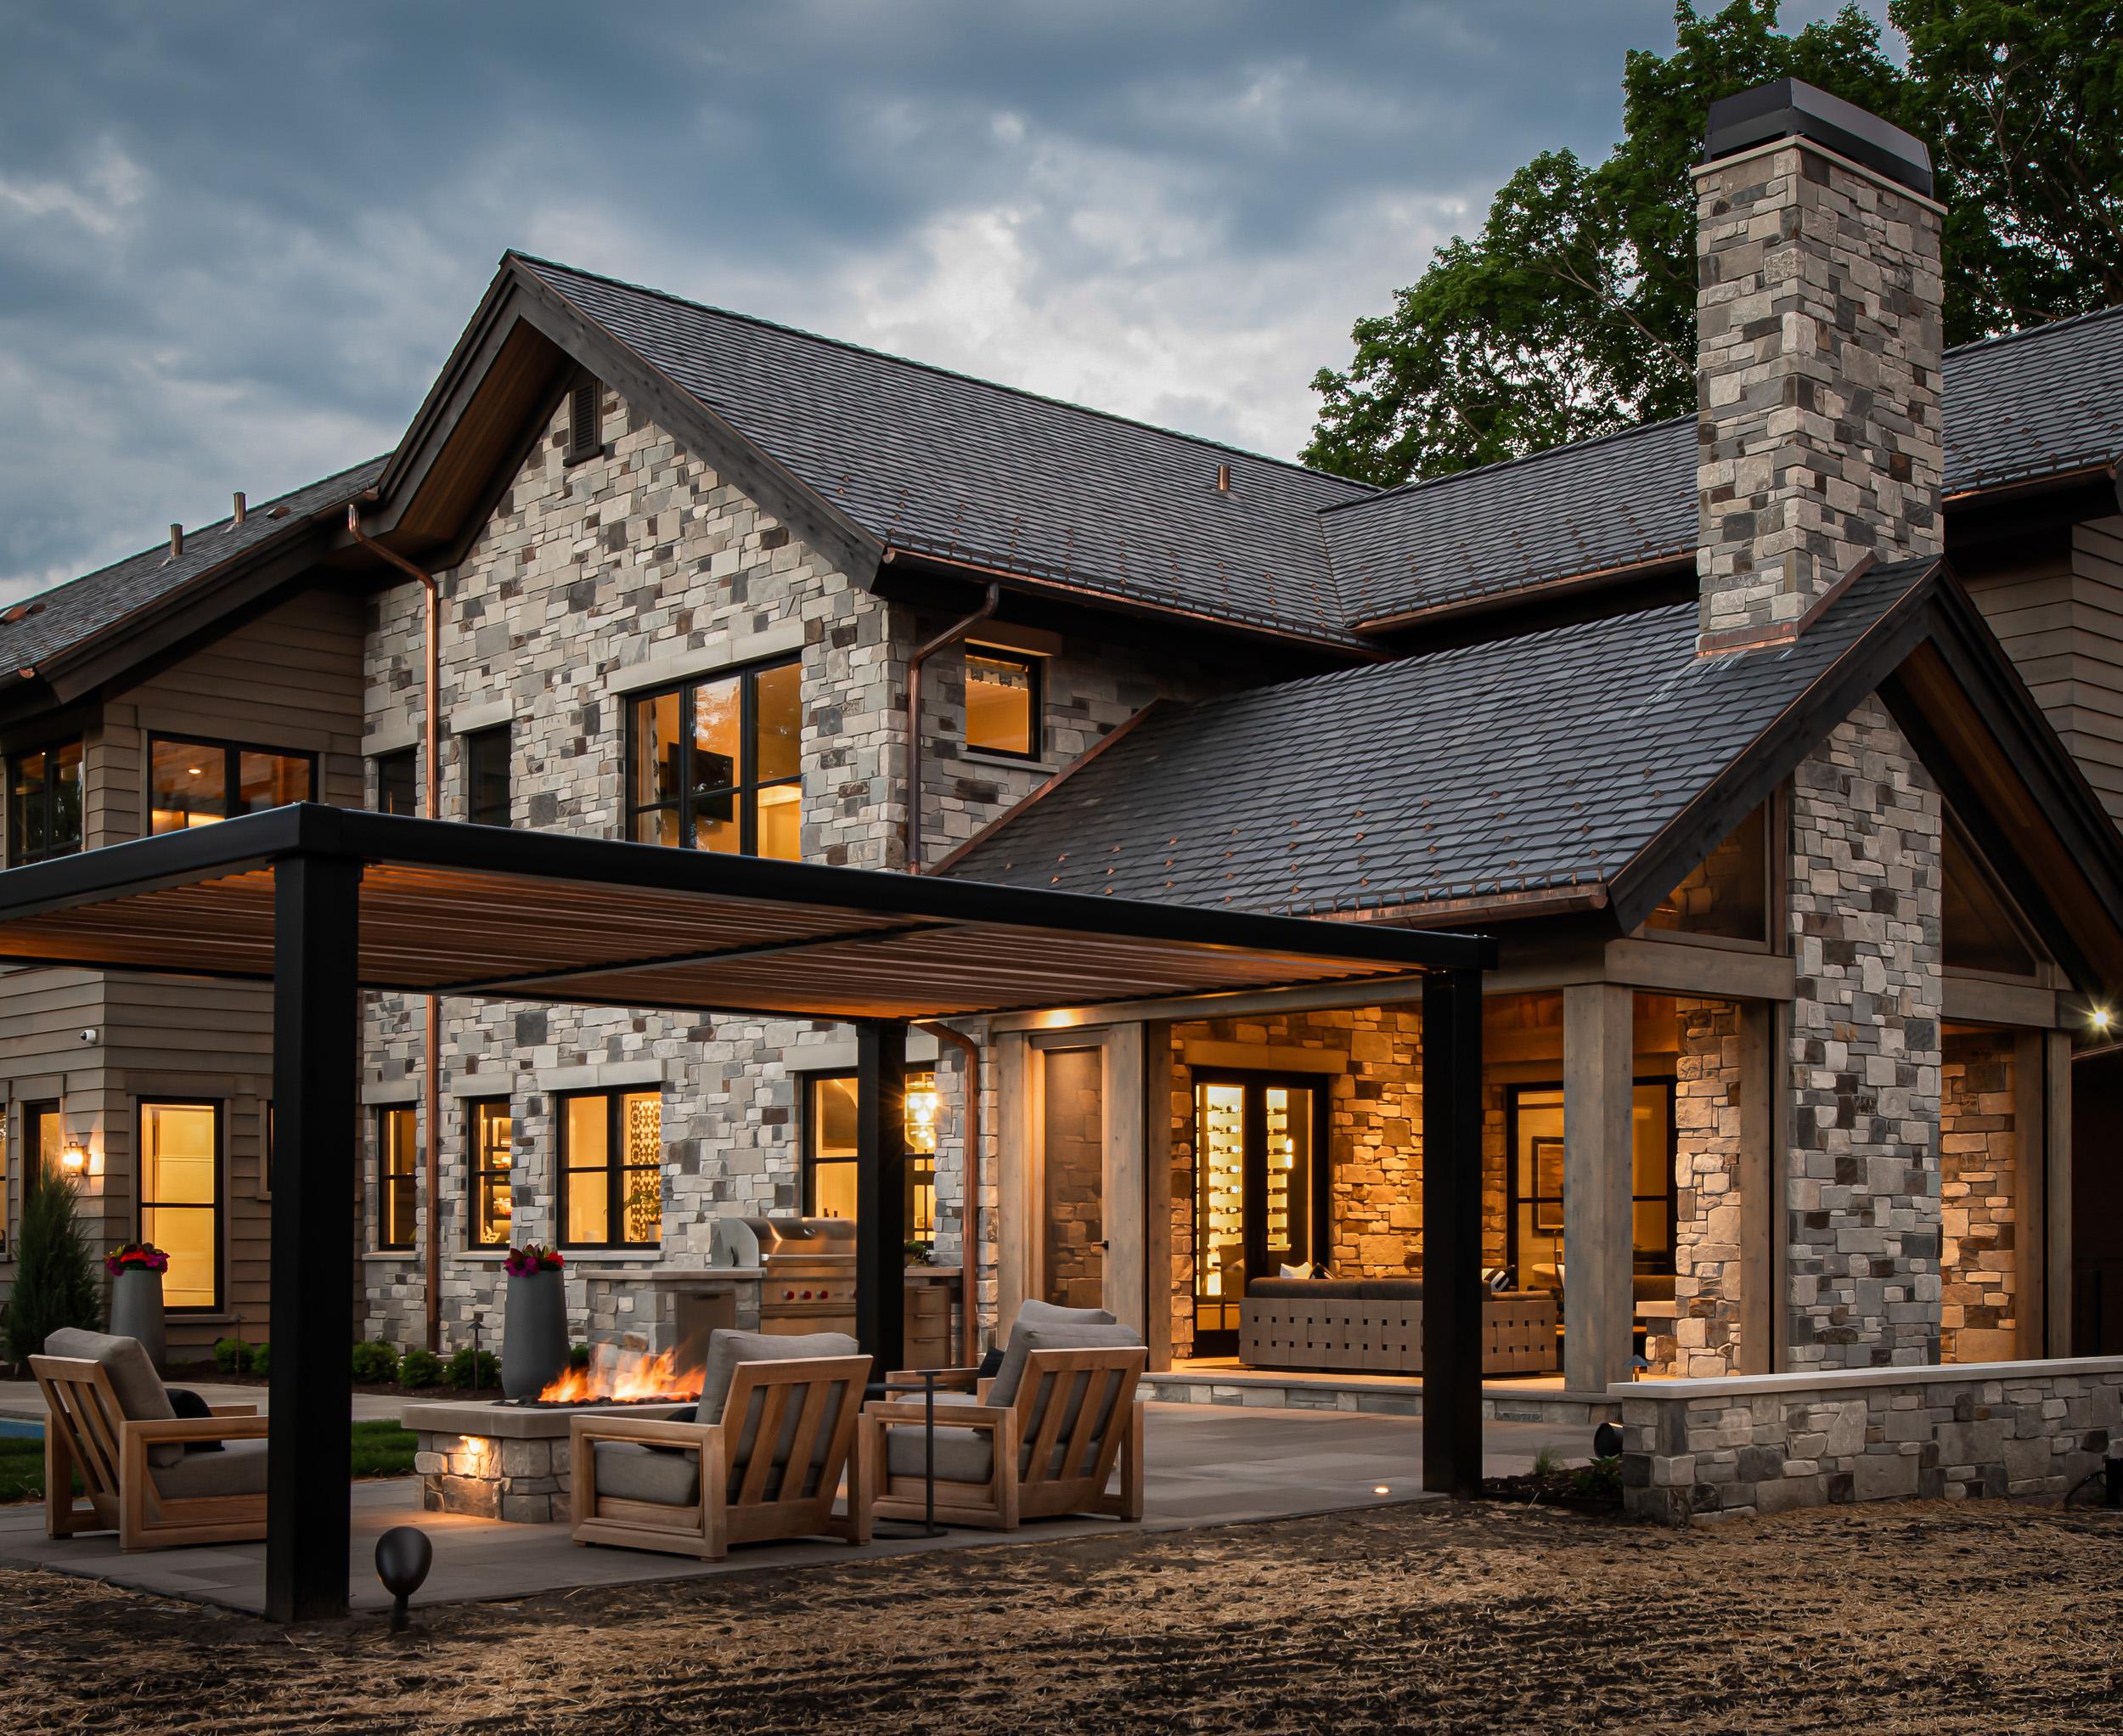 Modern Rustic - Exterior Porch